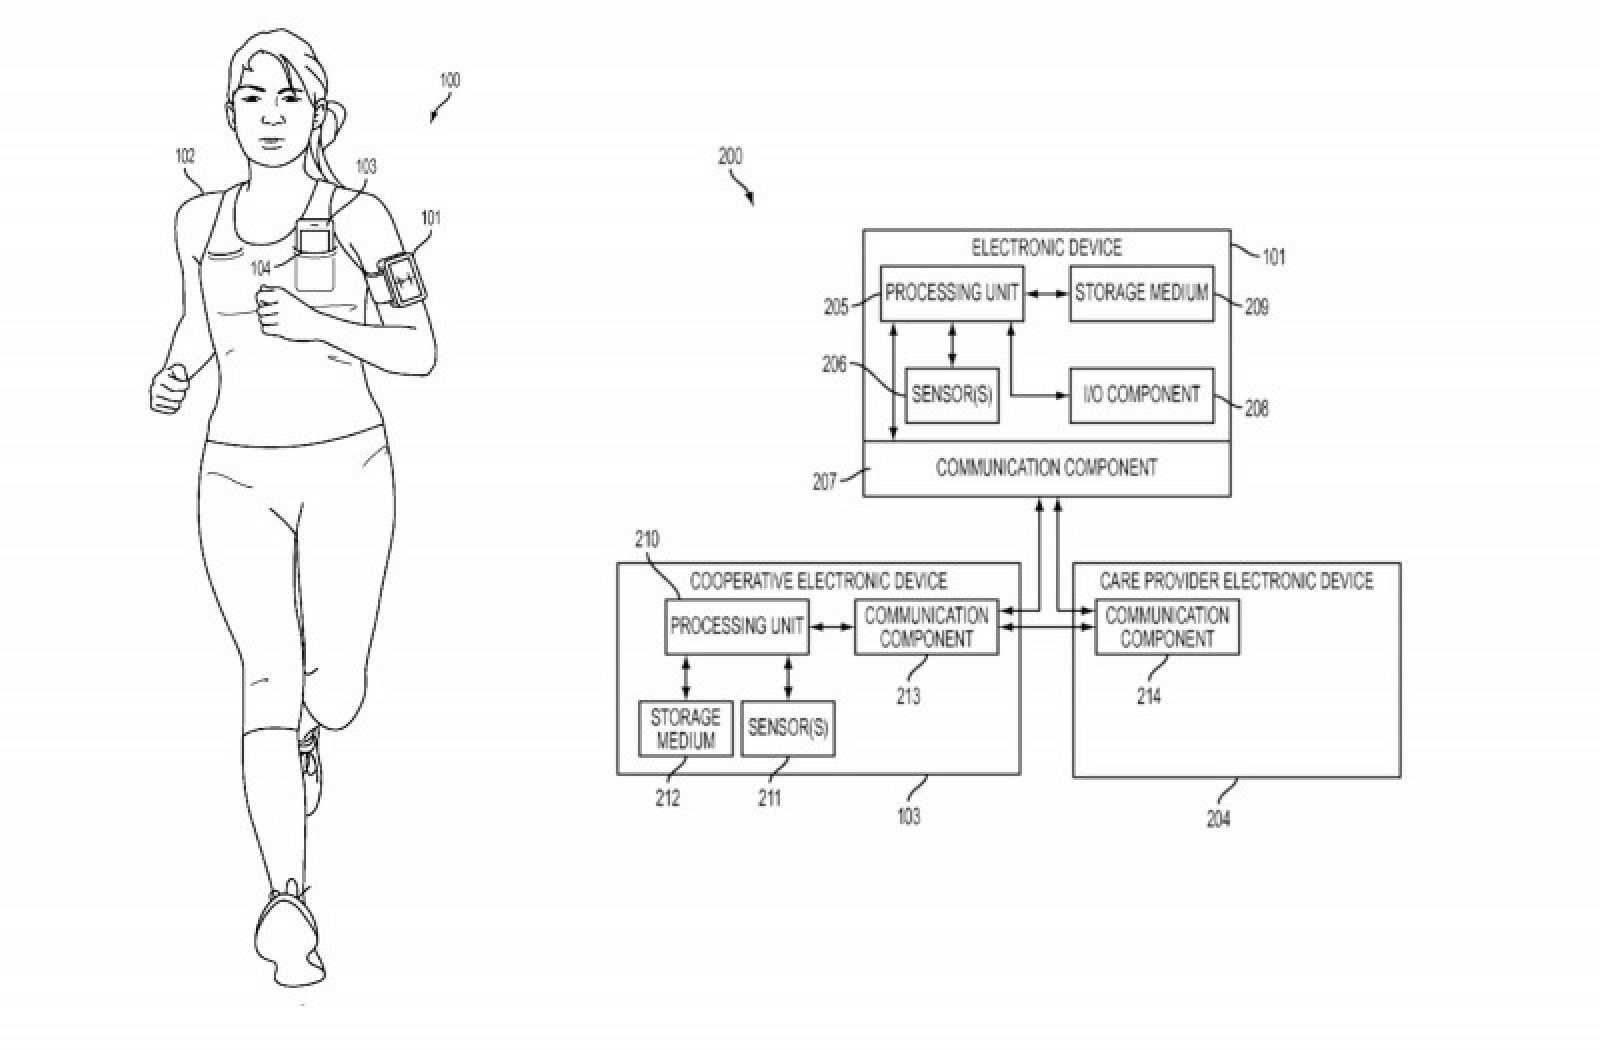 patent-800x525.jpg